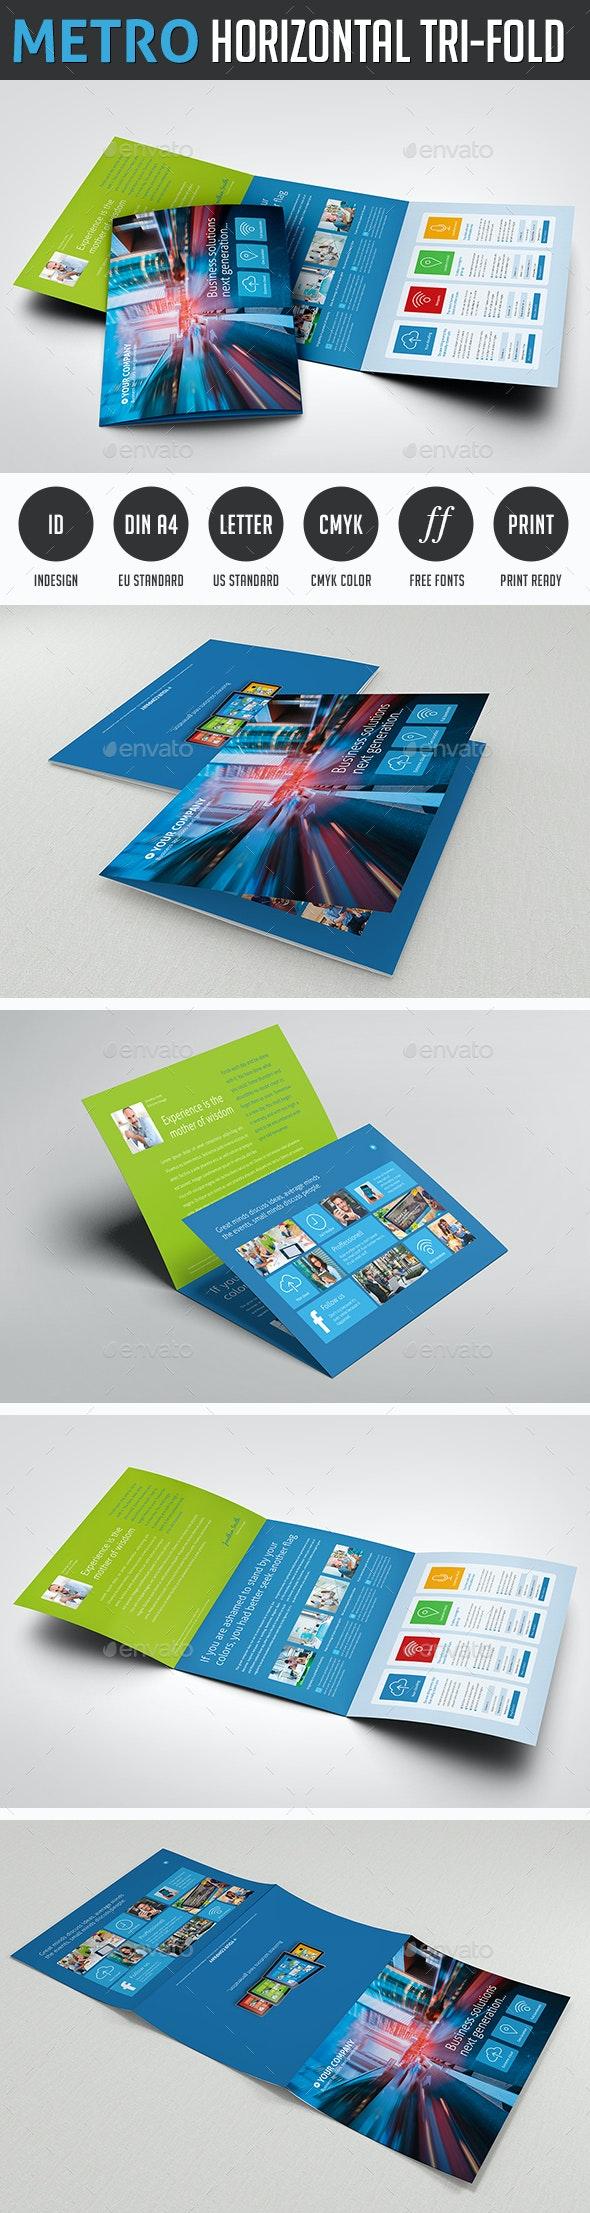 Metro Tri-fold Horizontal Brochure - Corporate Brochures